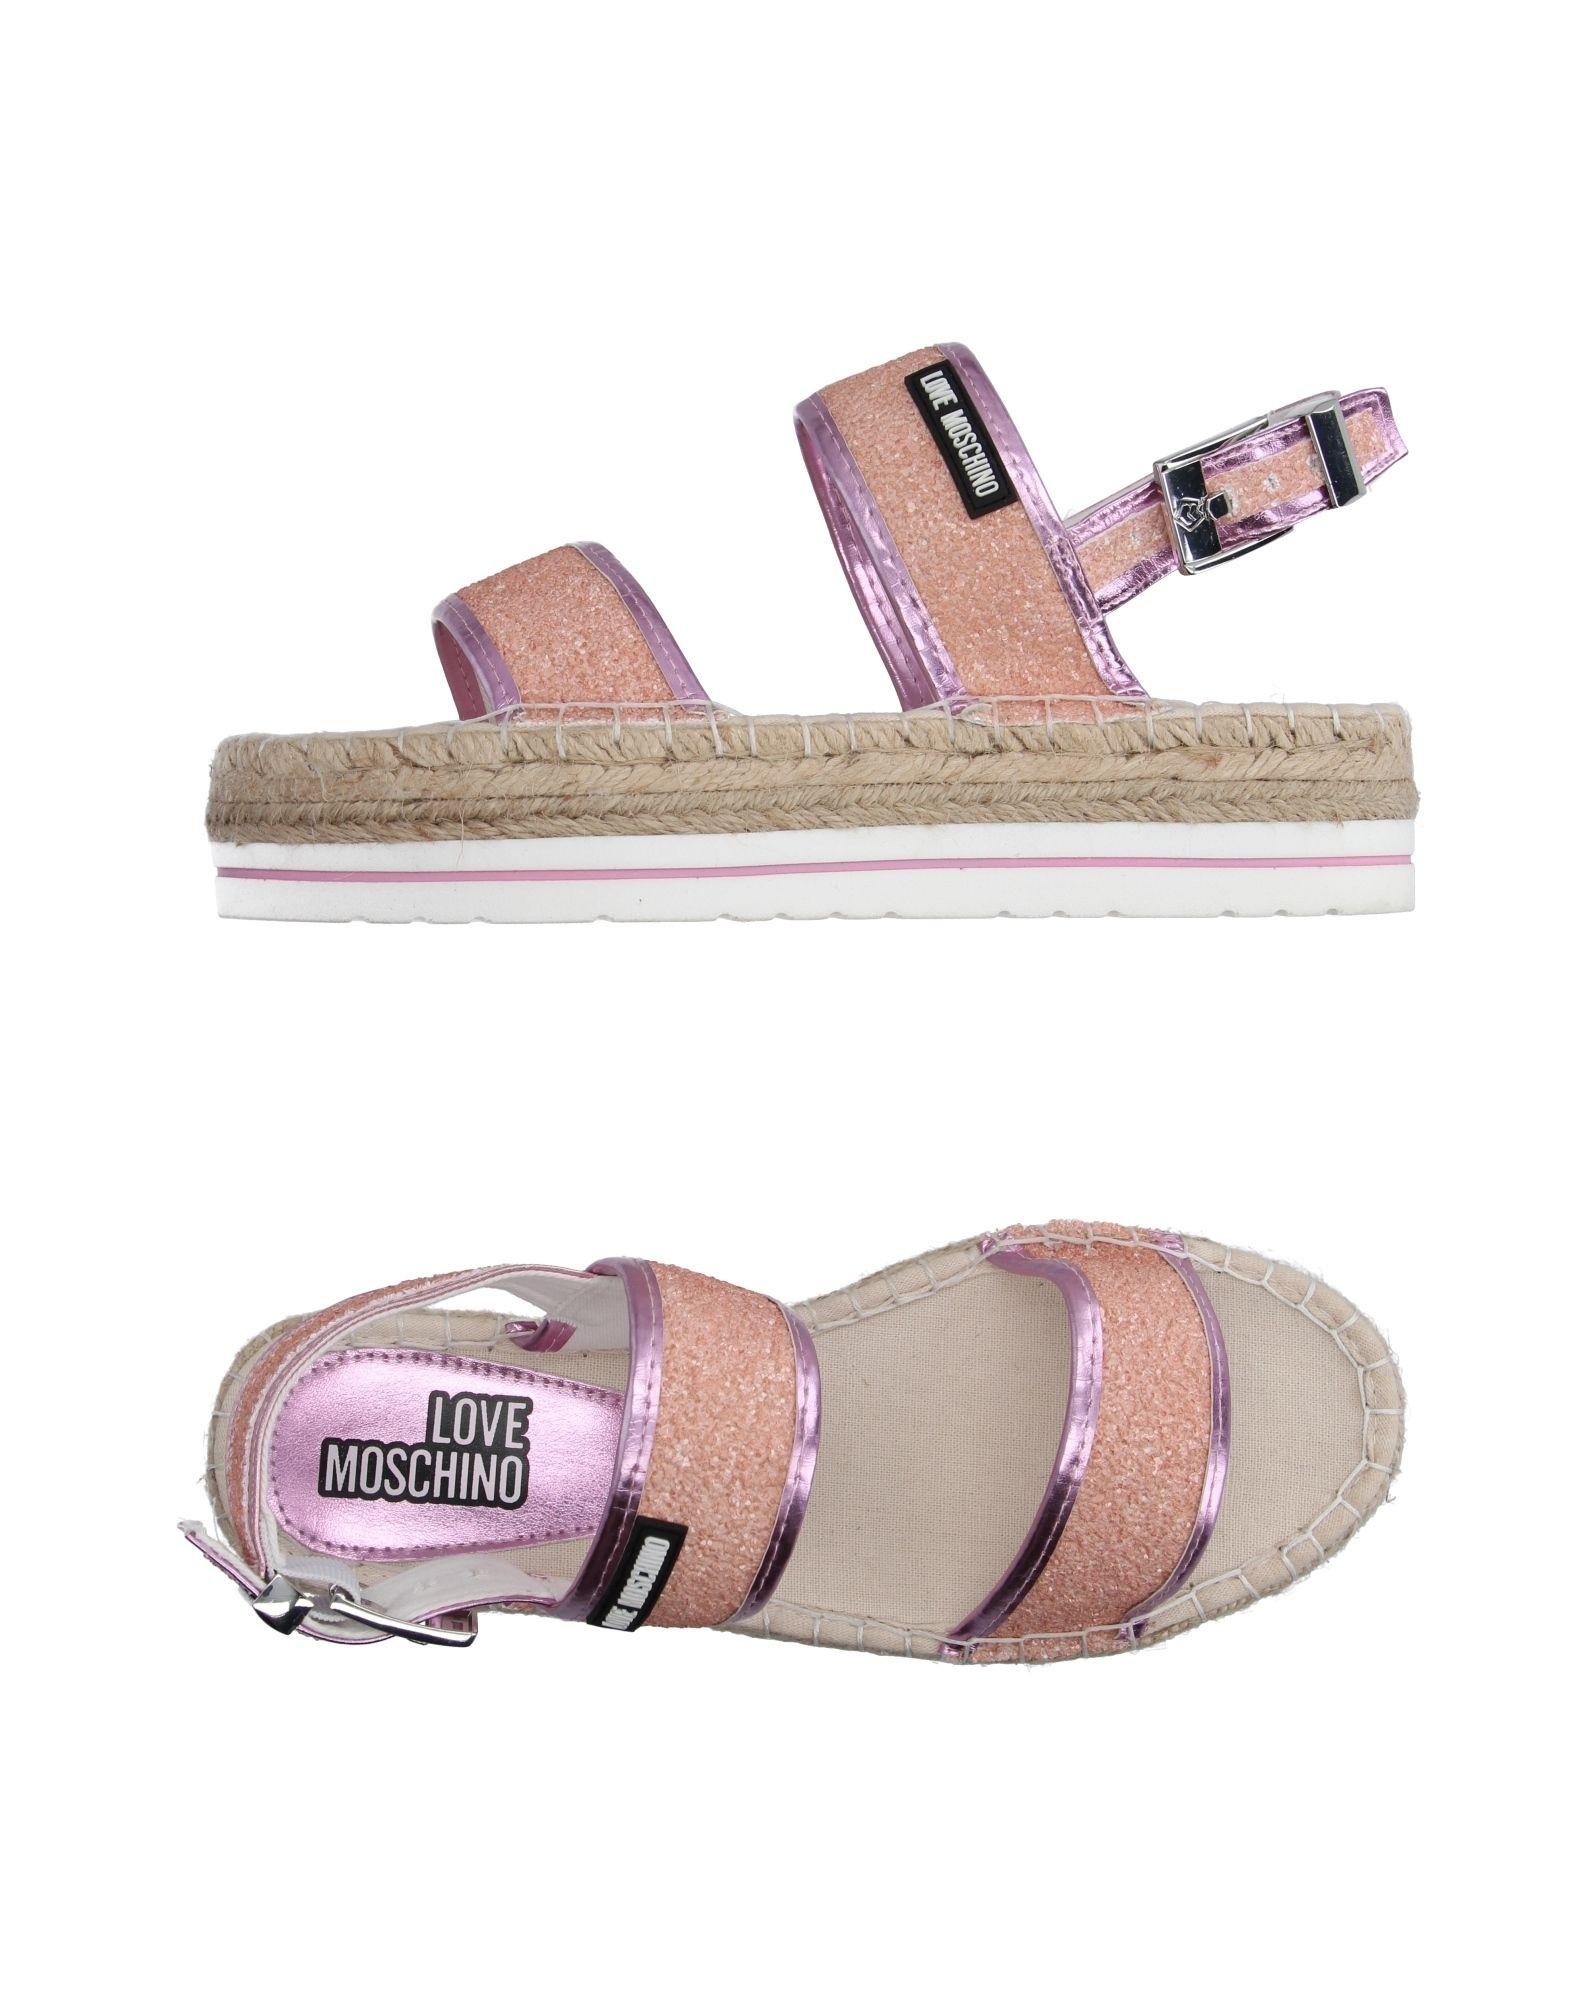 Love Moschino Espadrilles Damen  11101279UG Gute Qualität beliebte Schuhe